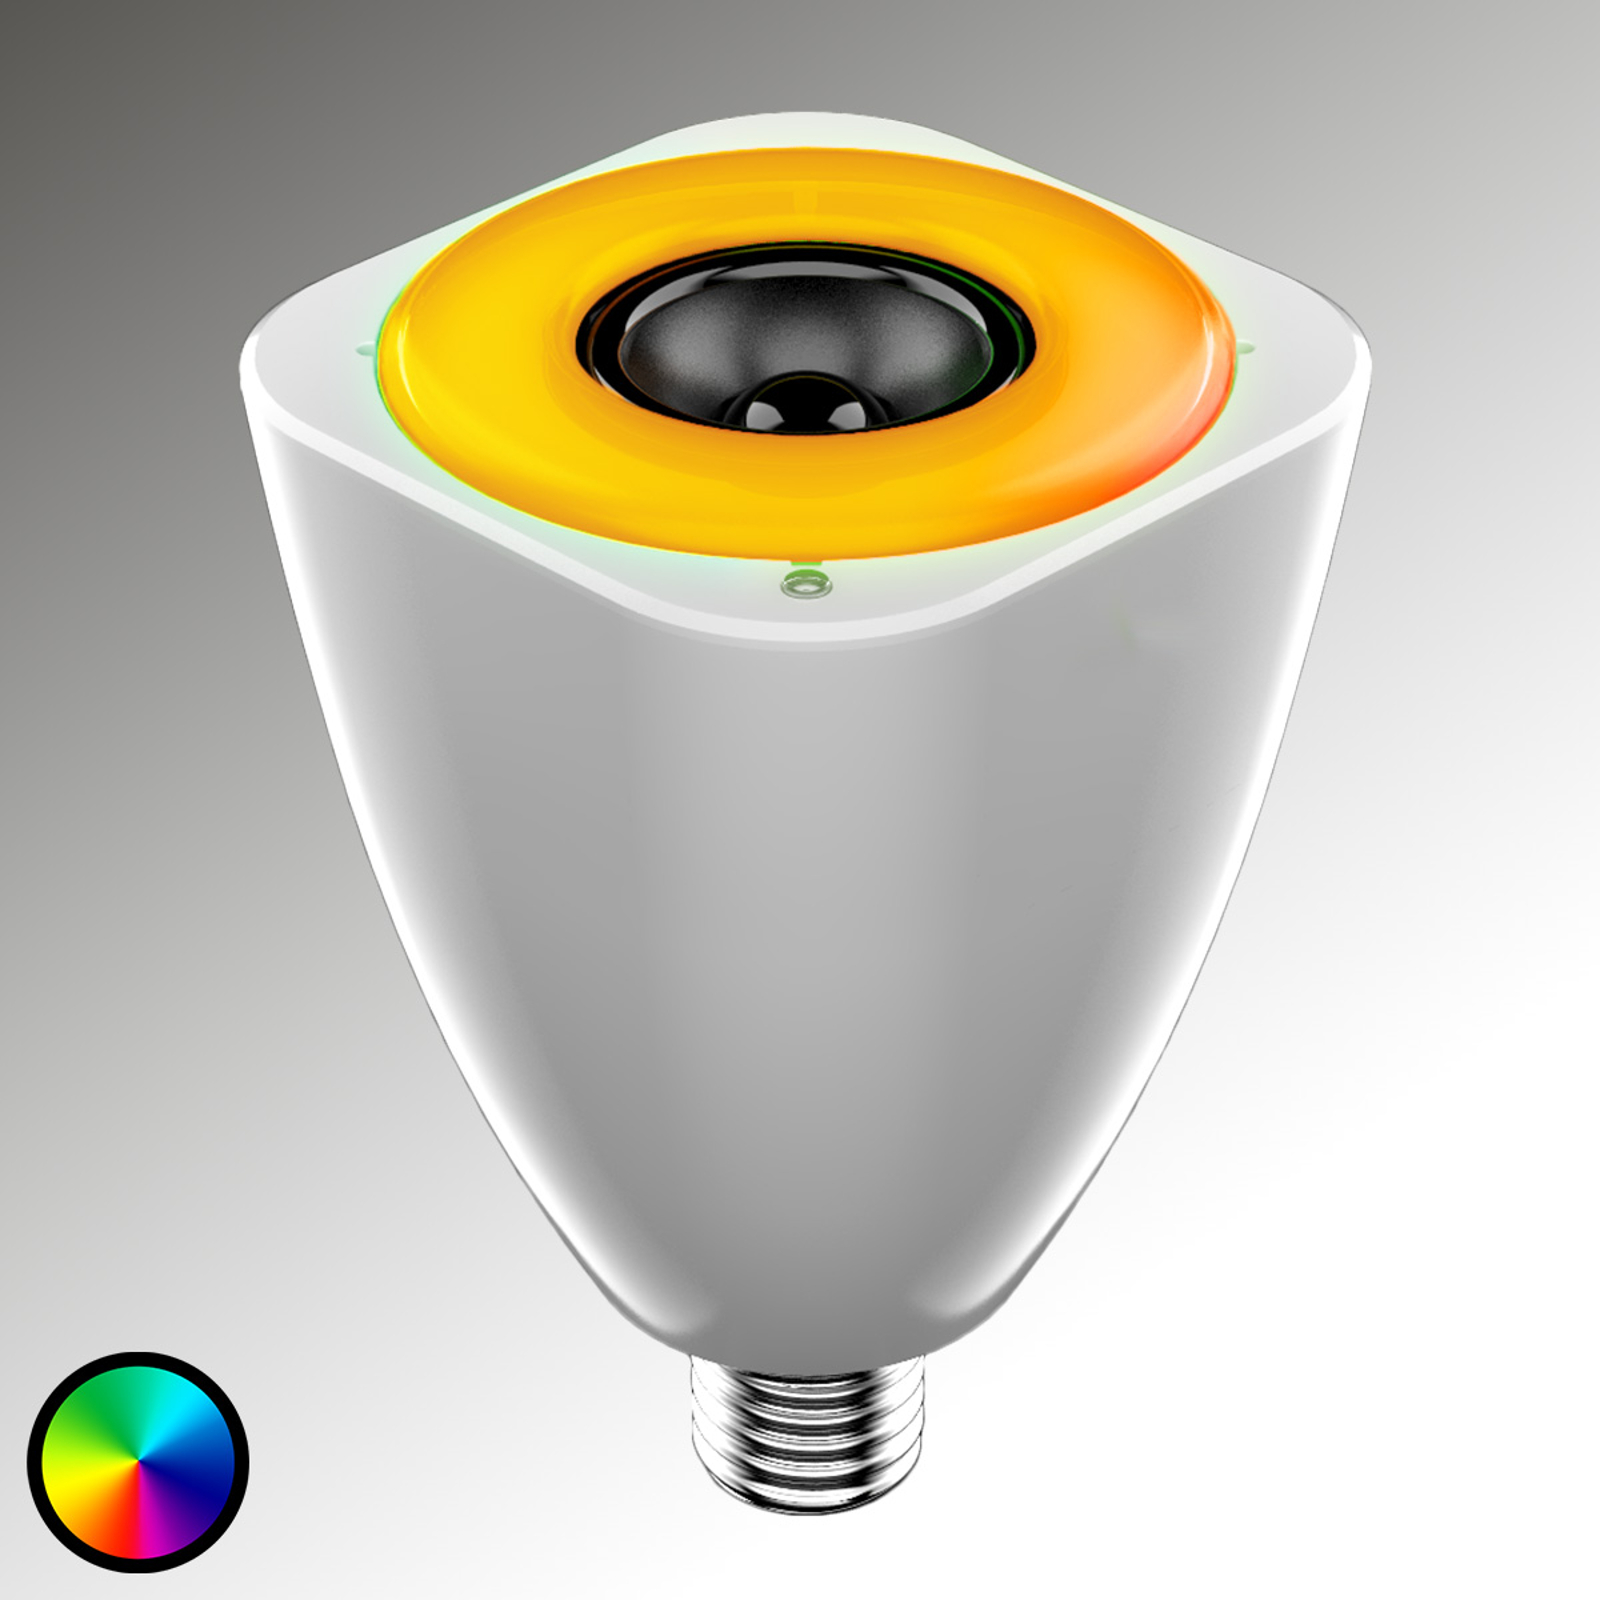 AwoX StriimLIGHT WiFi-Color LED-Lampe E27, 7 W